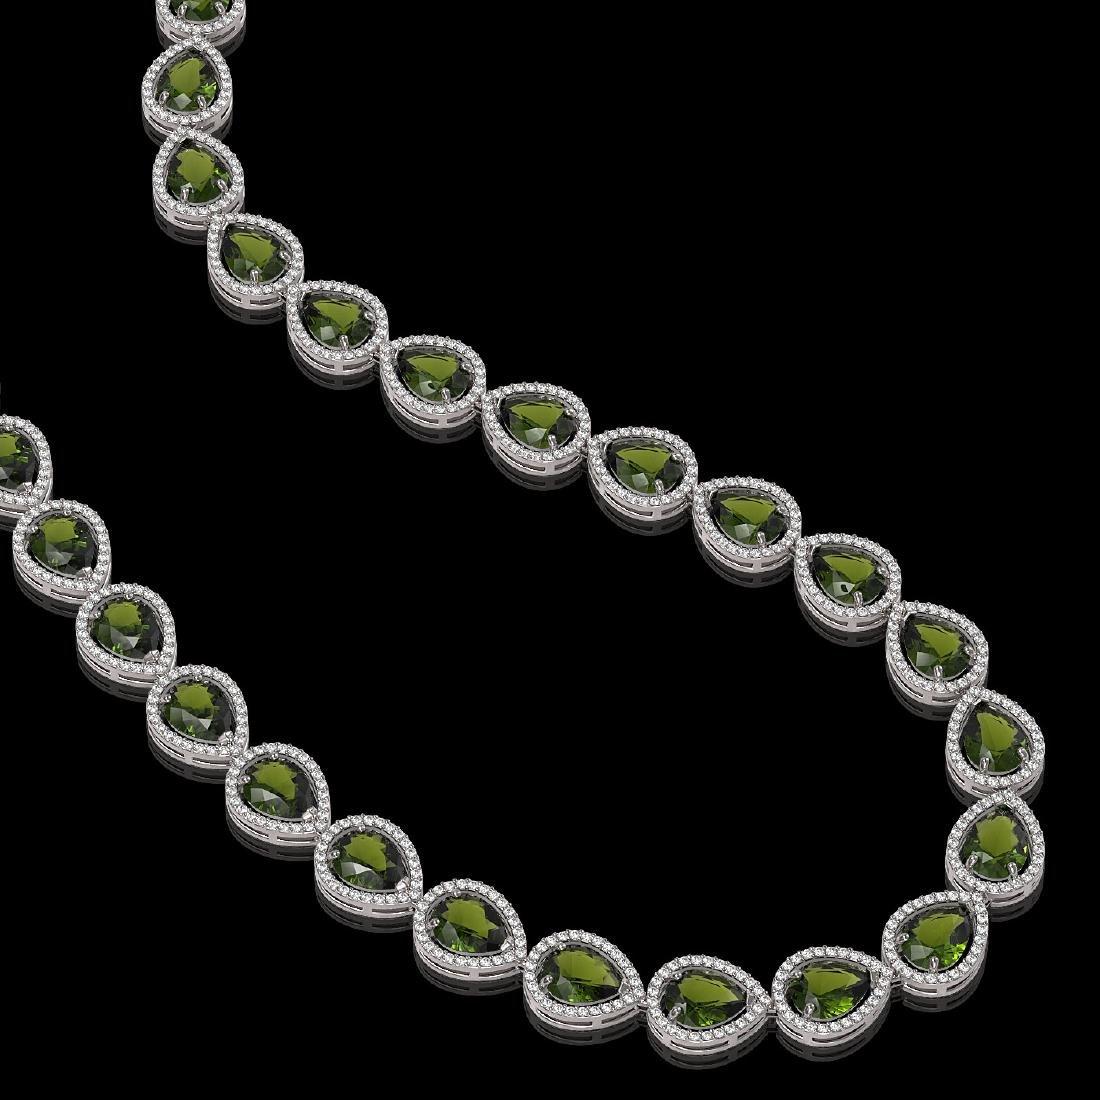 41.6 CTW Tourmaline & Diamond Halo Necklace 10K White - 2